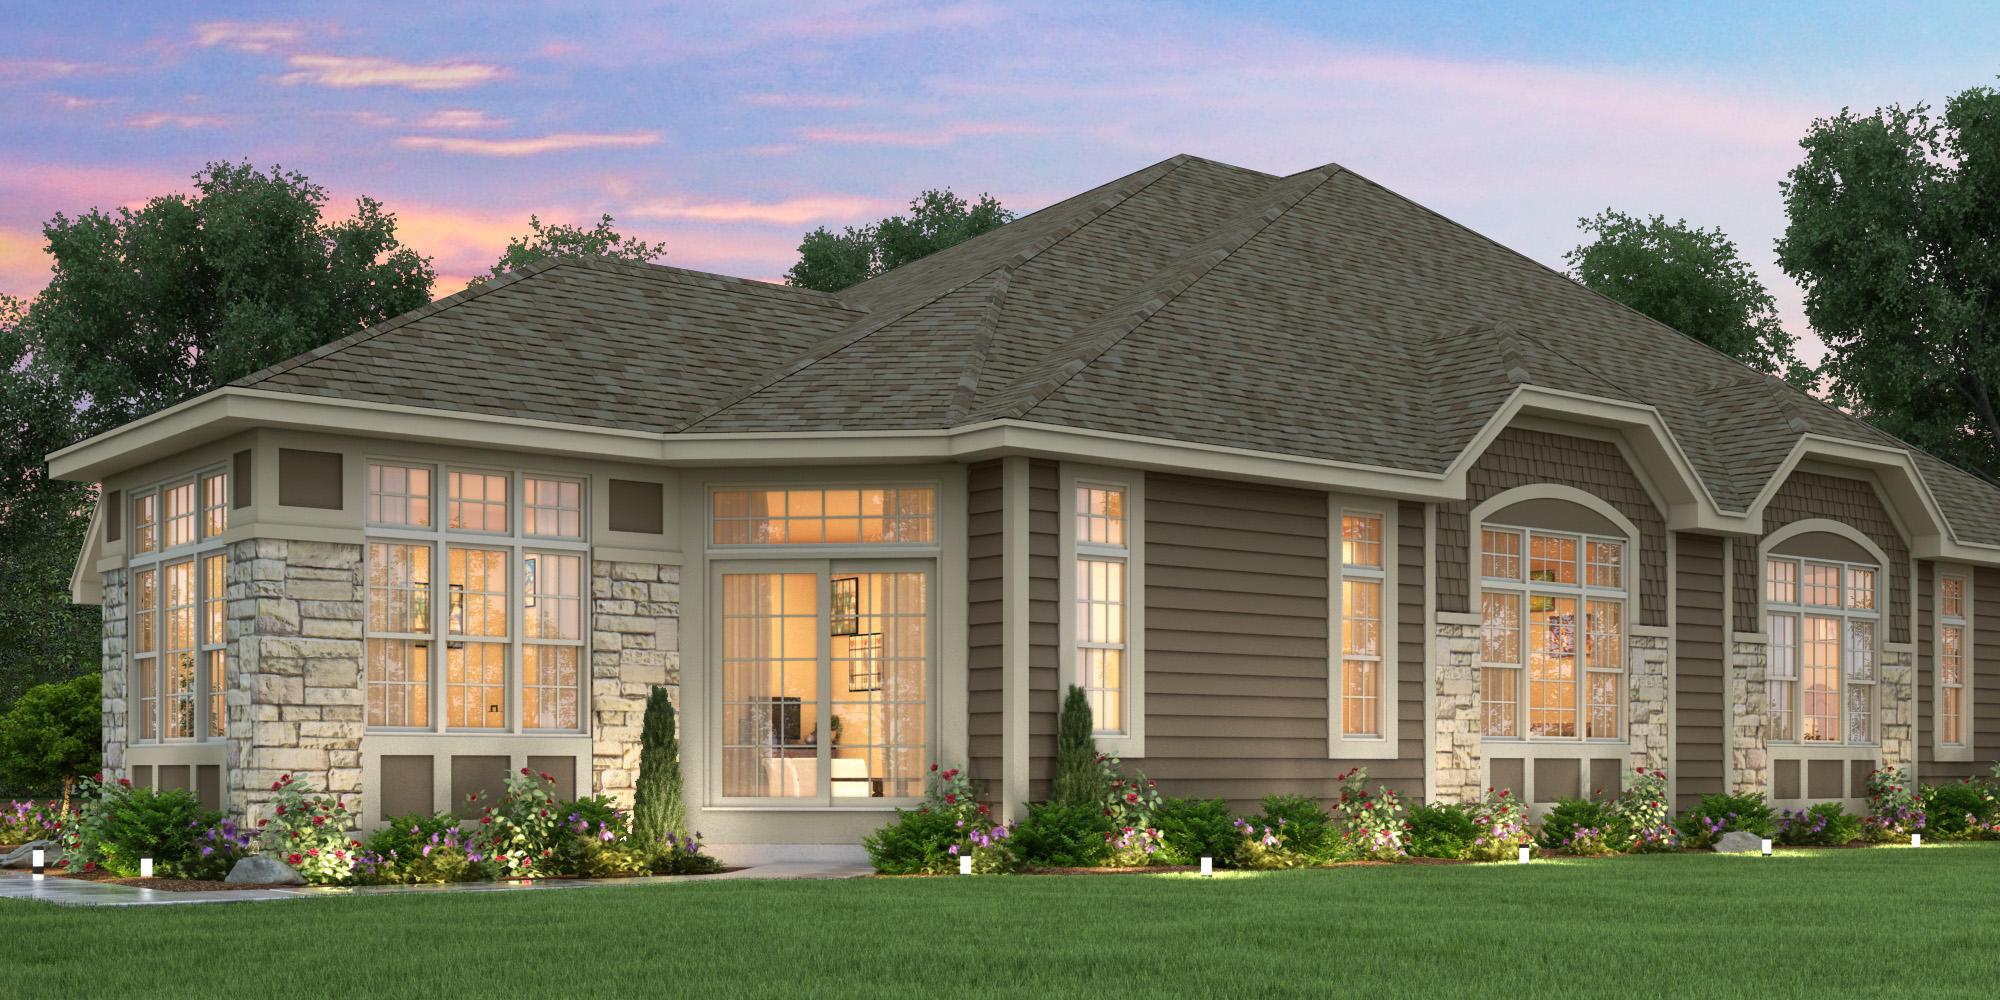 13775 Creekside Pass, Brookfield, Wisconsin 53005, 2 Bedrooms Bedrooms, 6 Rooms Rooms,2 BathroomsBathrooms,Condominiums,For Sale,Creekside Pass,1,1711948